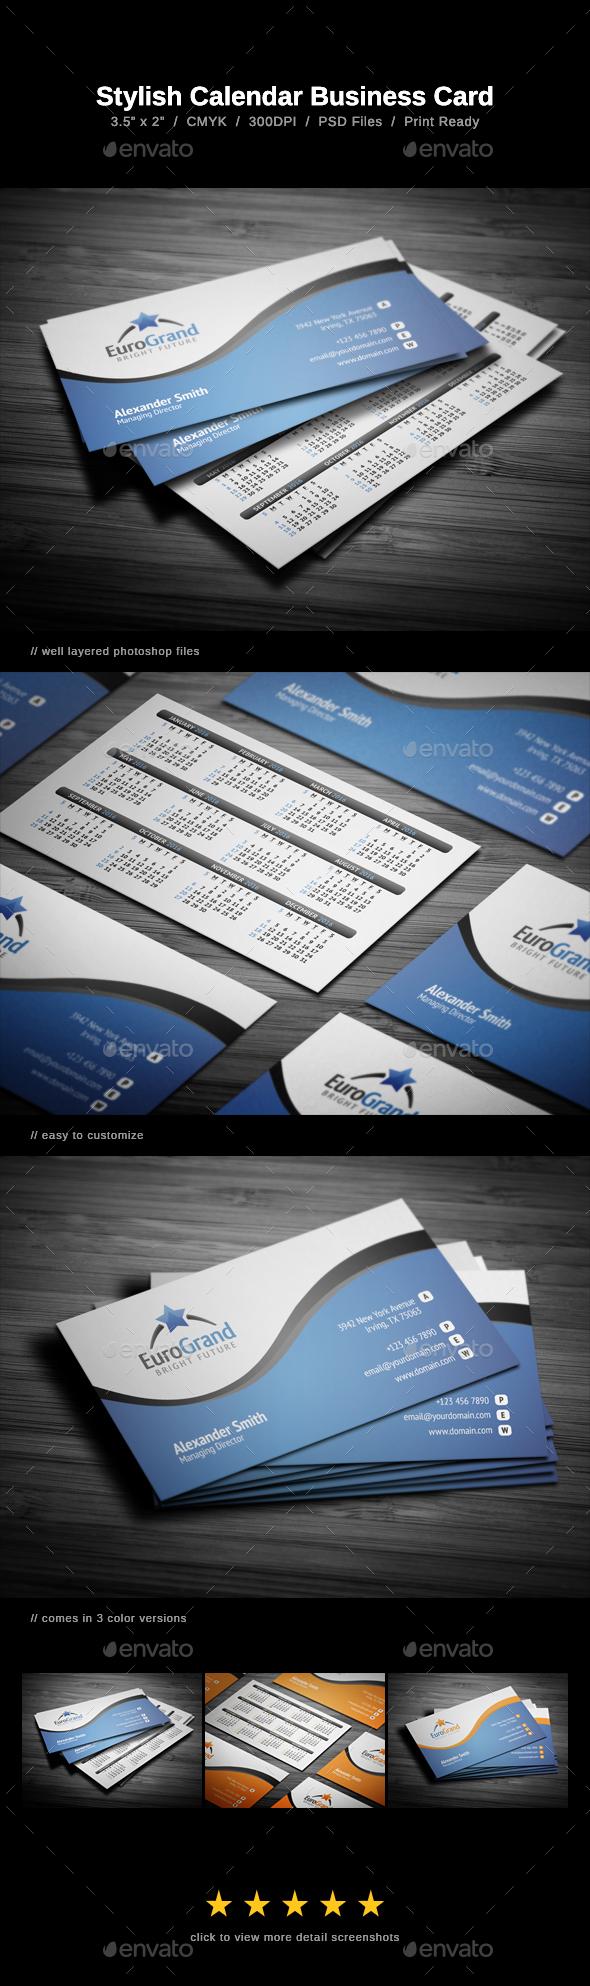 Stylish Calendar Business Card - Calendars Stationery